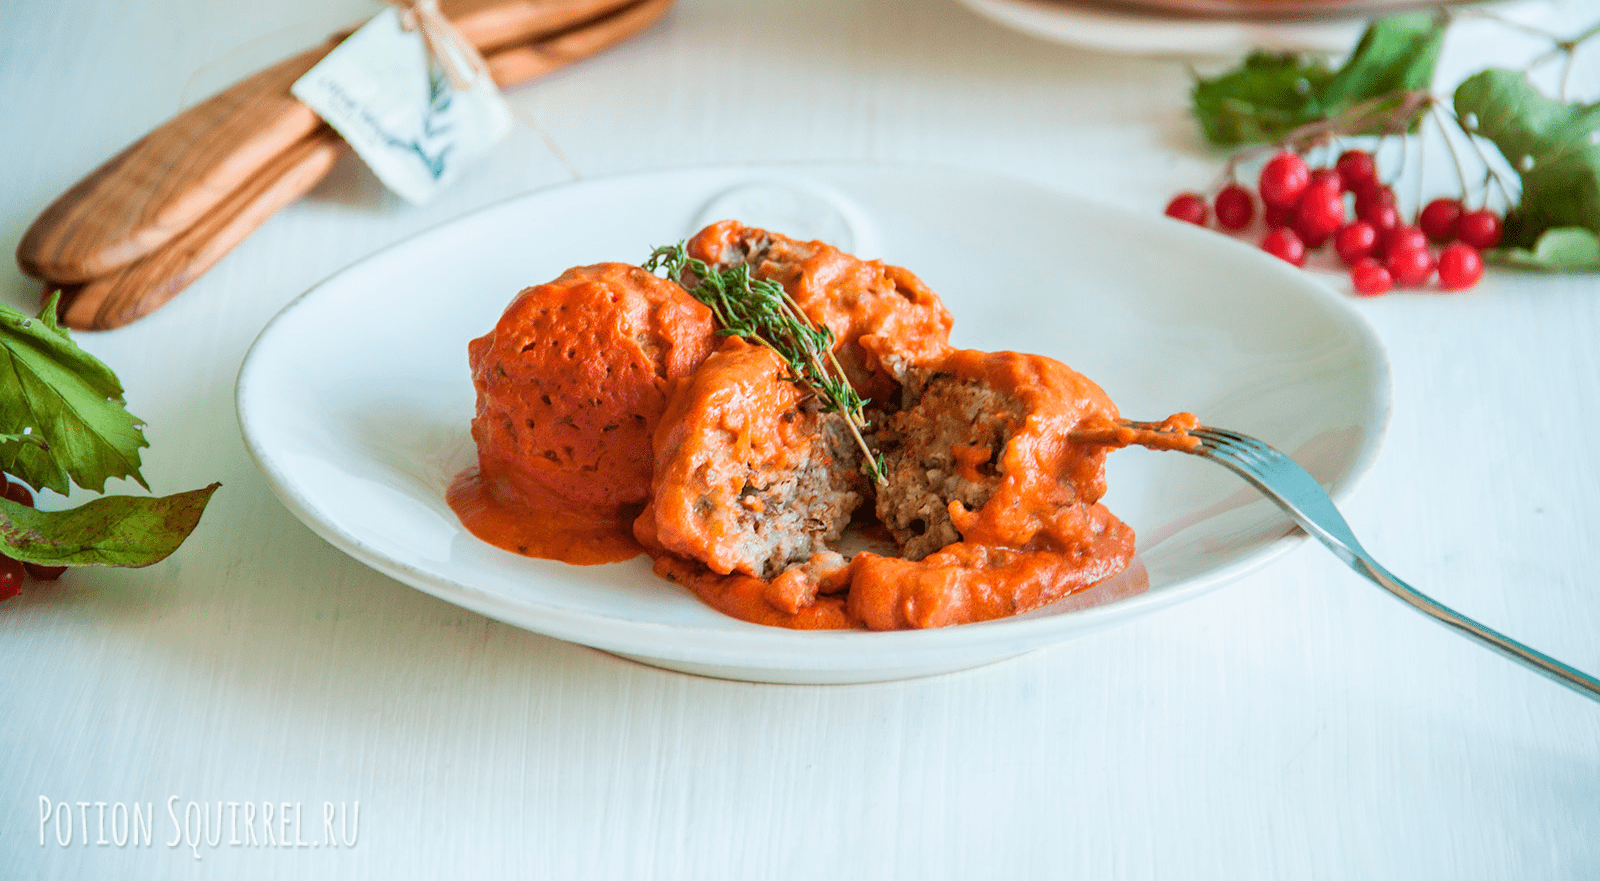 Vegan lentil meatballs in tomatoe sauce by potionsquirrel.ru